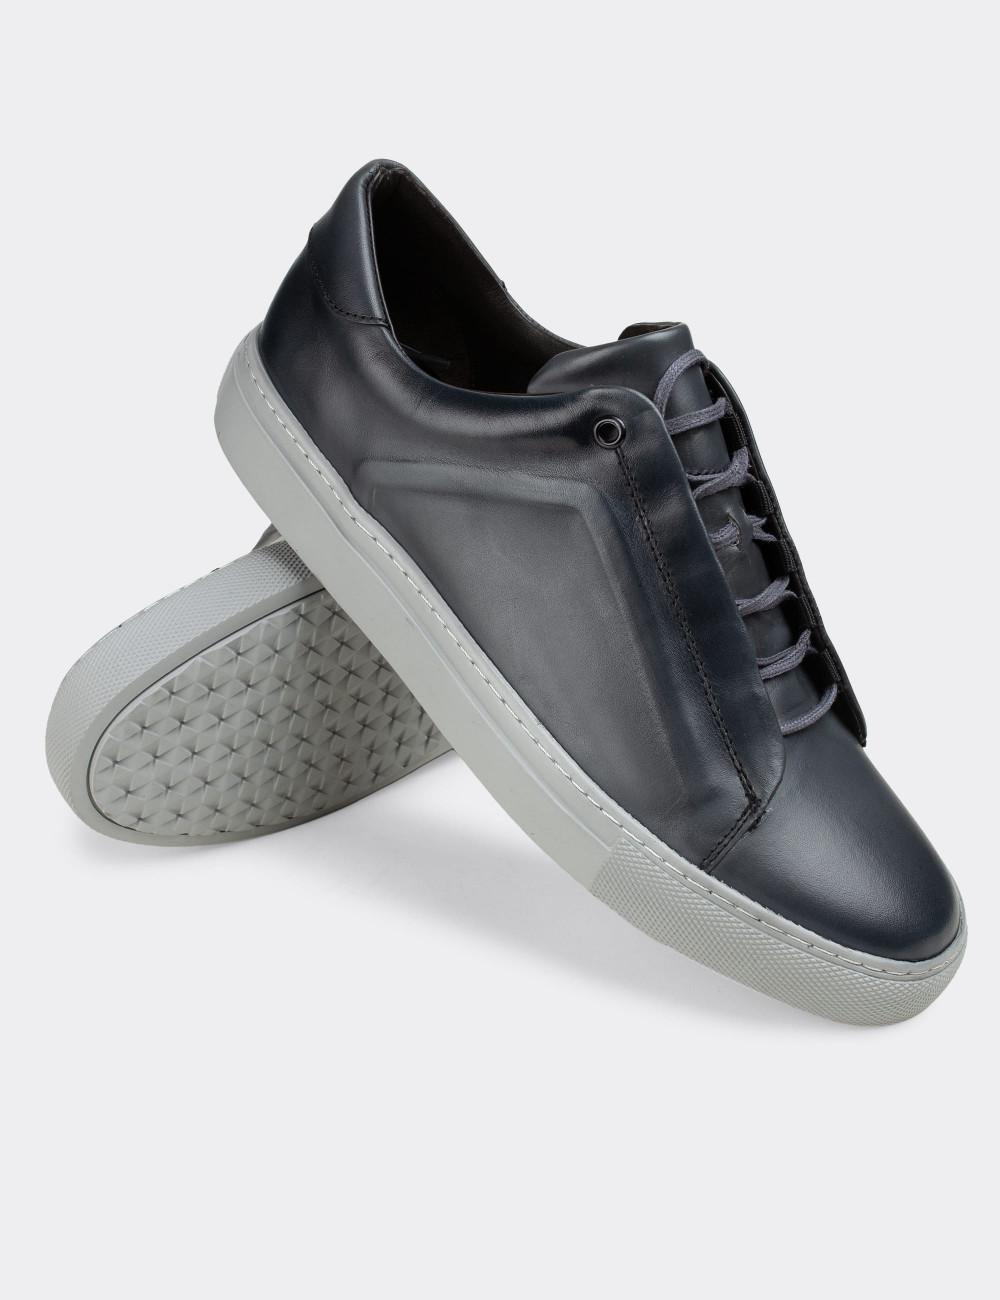 Hakiki Deri Gri Sneaker Erkek Ayakkabı - 01831MGRIC01